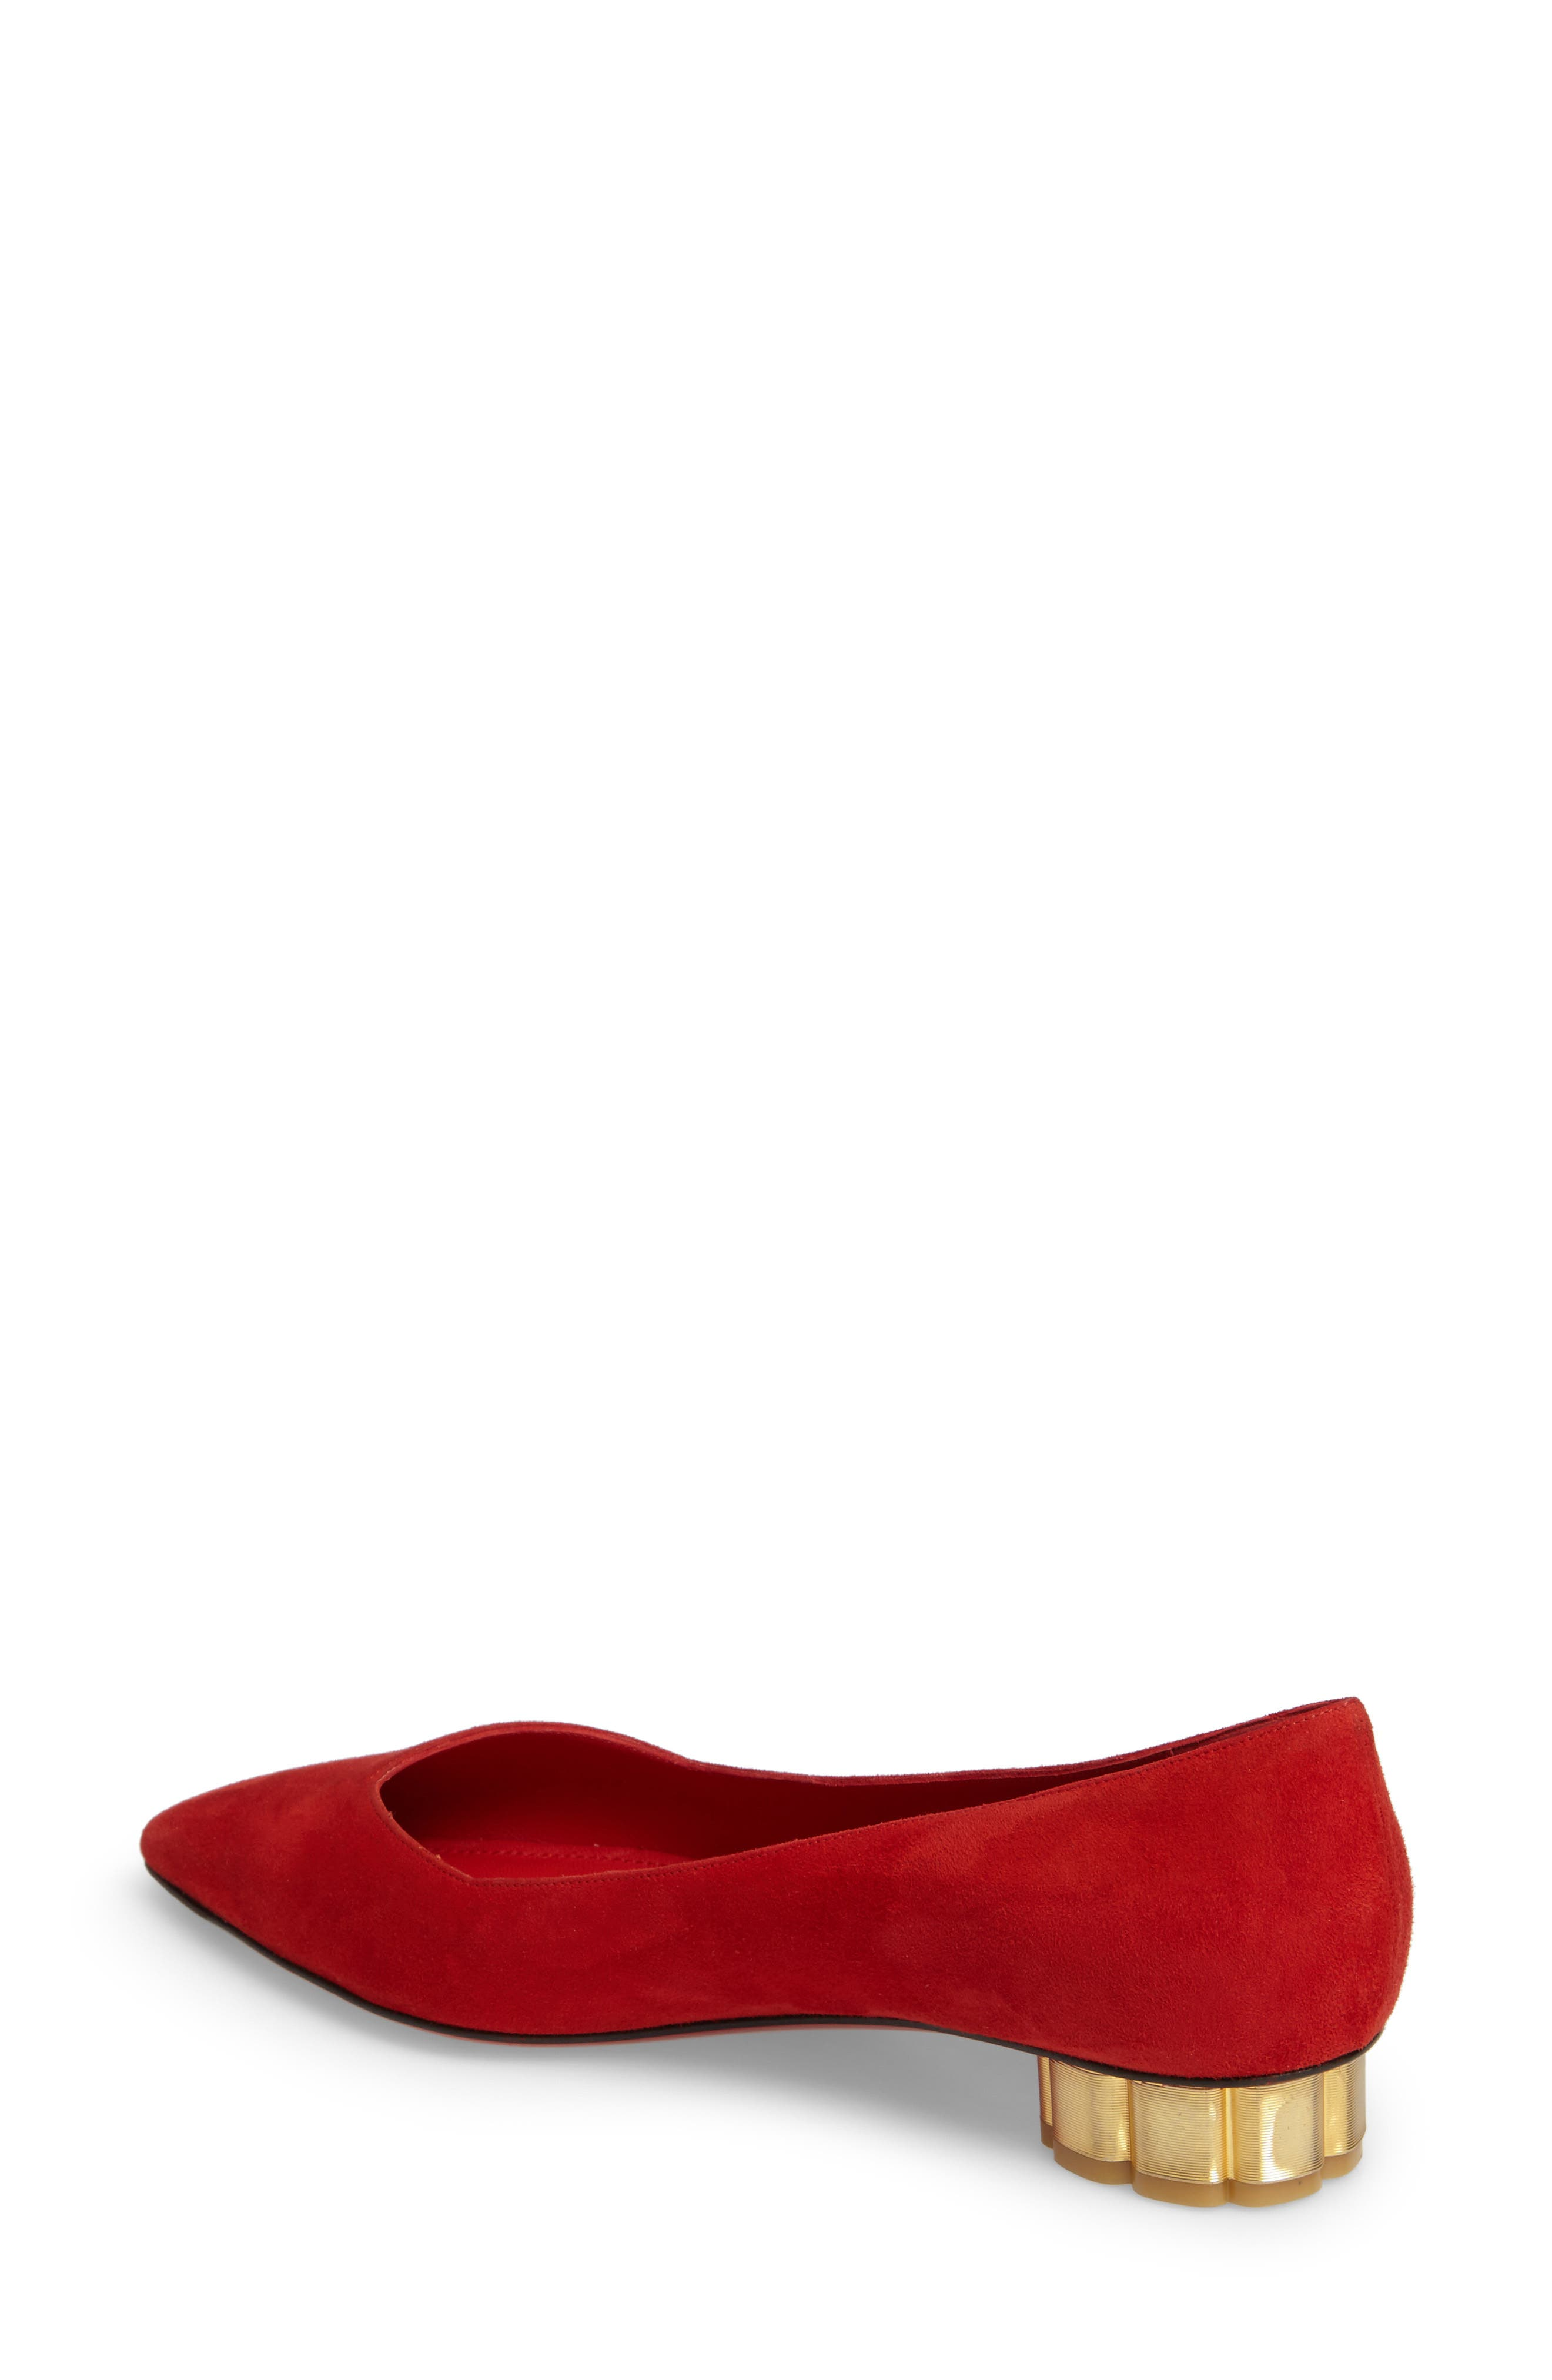 Alternate Image 2  - Salvatore Ferragamo Flower Heel Pump (Women)